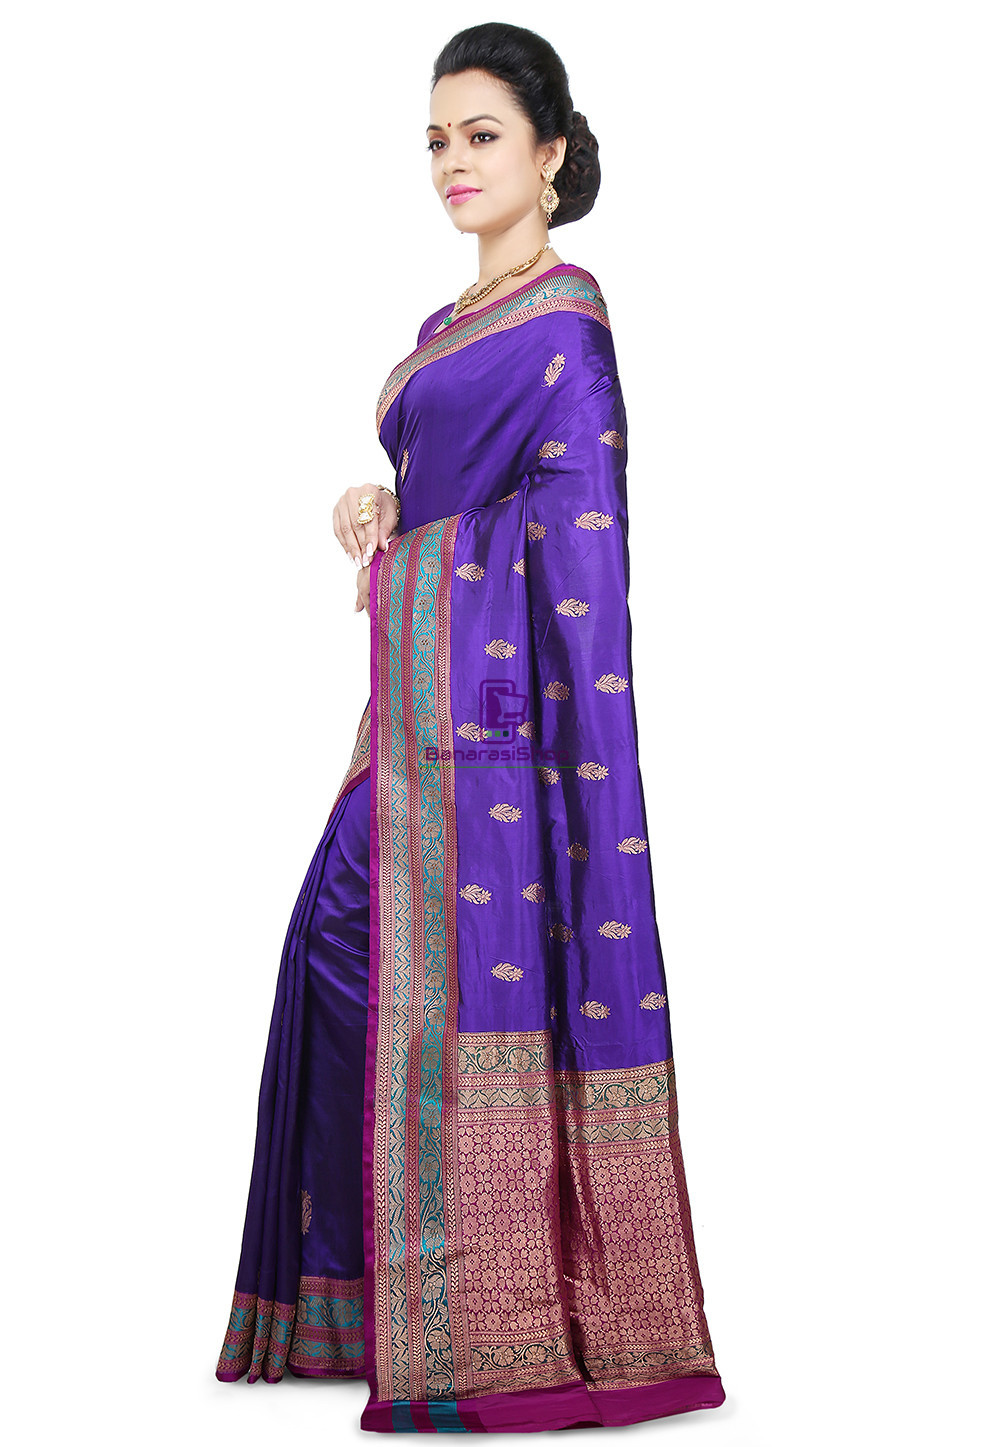 Banarasi Pure Katan Silk Handloom Saree in Indigo 5